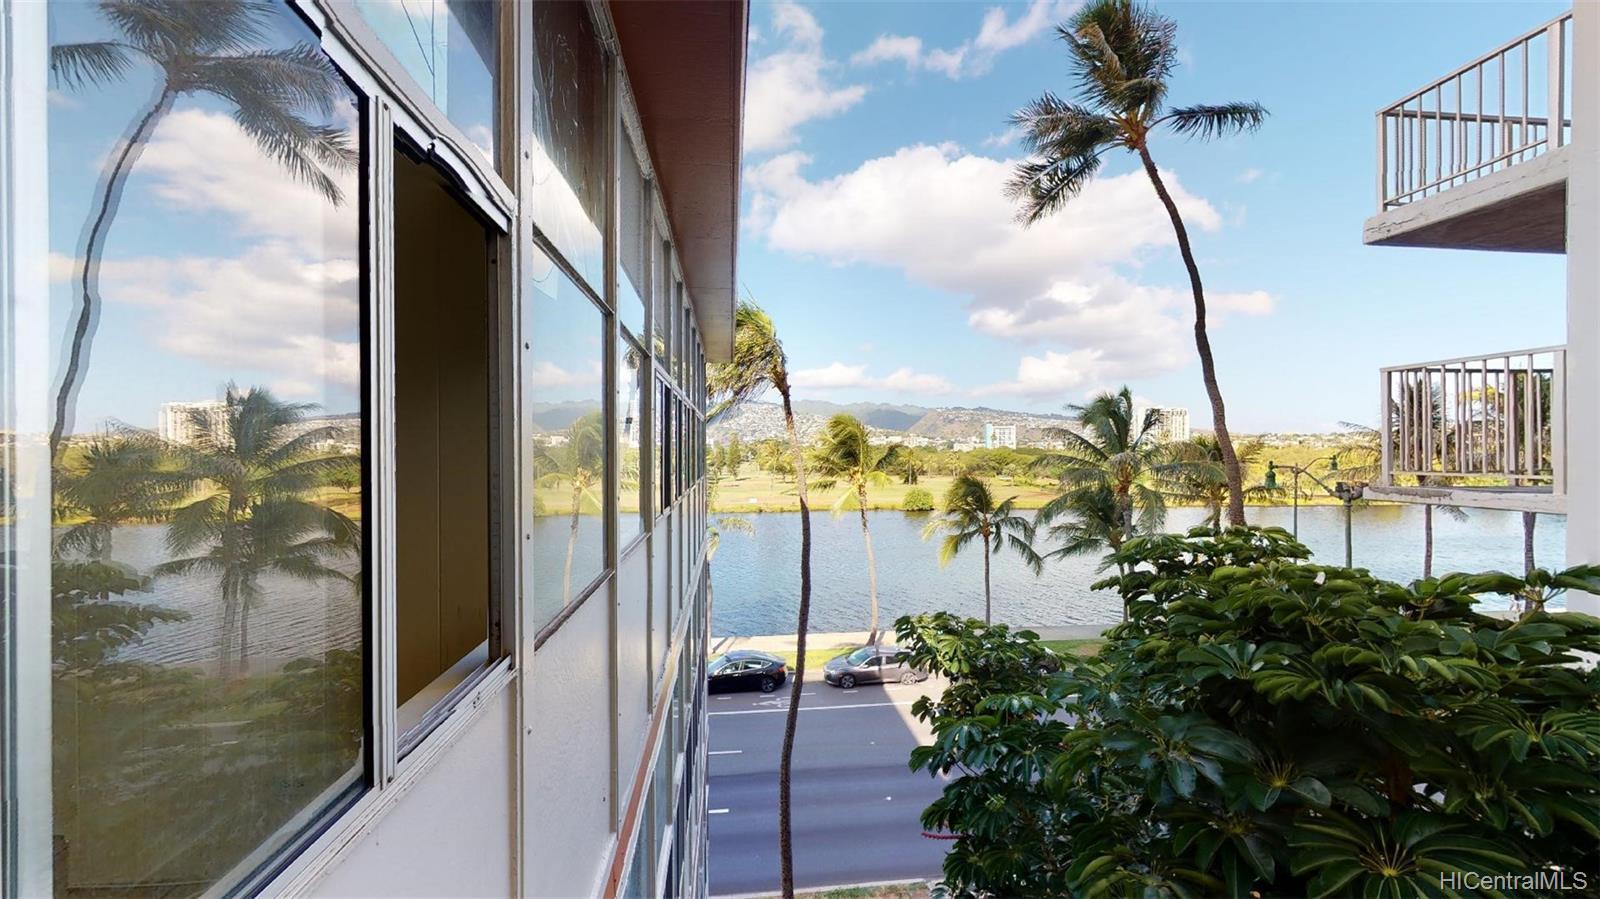 2319 Ala Wai Blvd Honolulu Oahu commercial real estate photo9 of 21